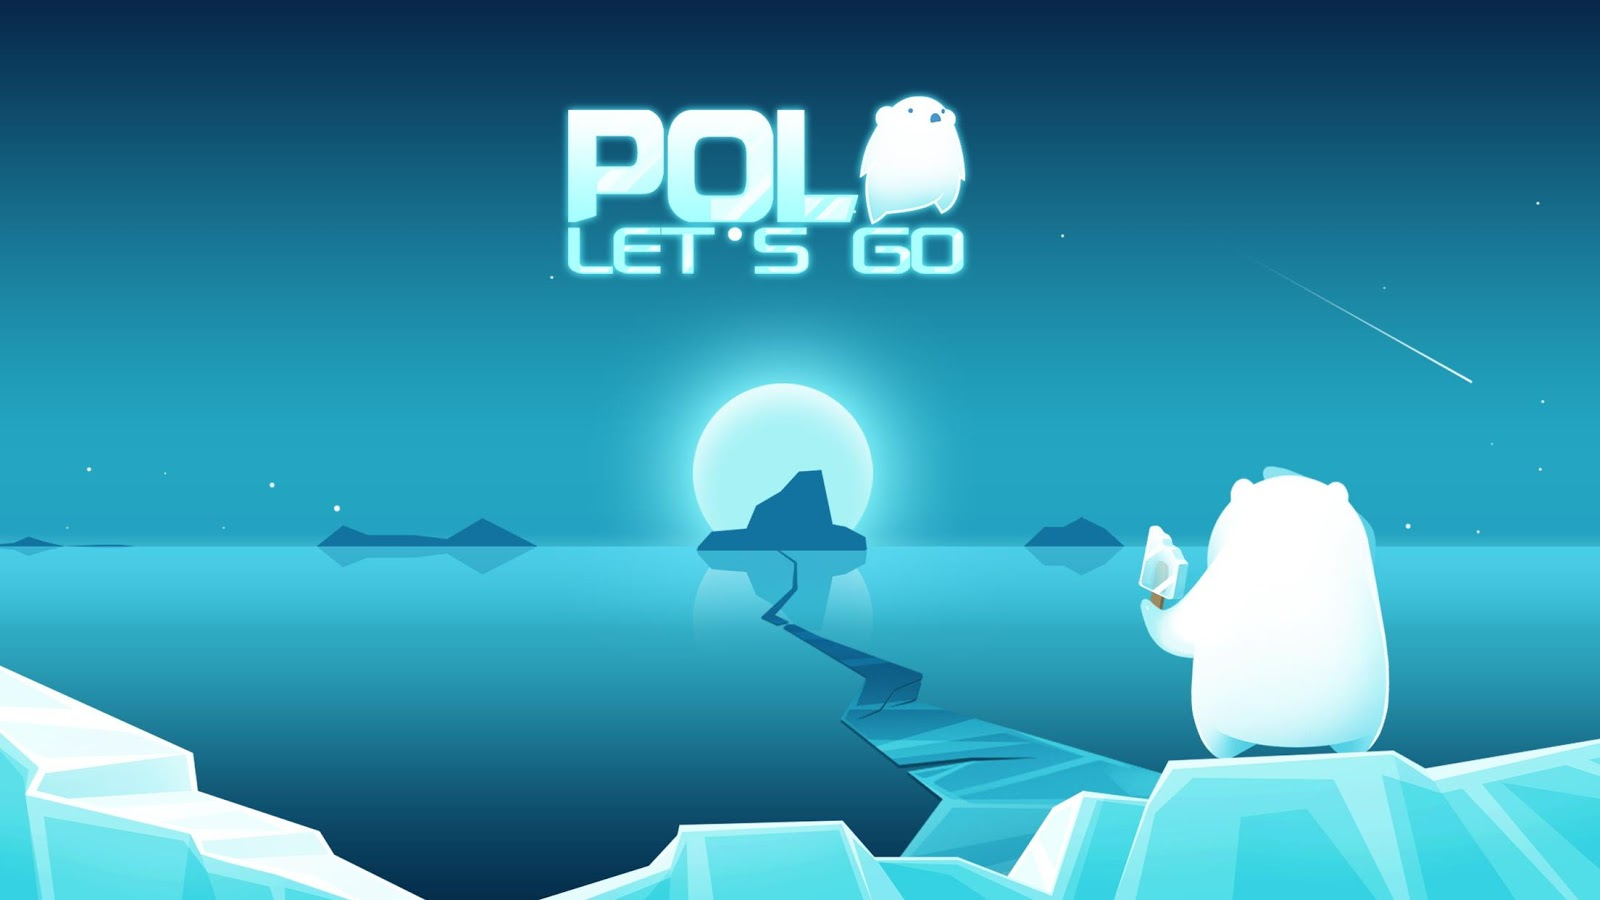 POL! Let's Go!w